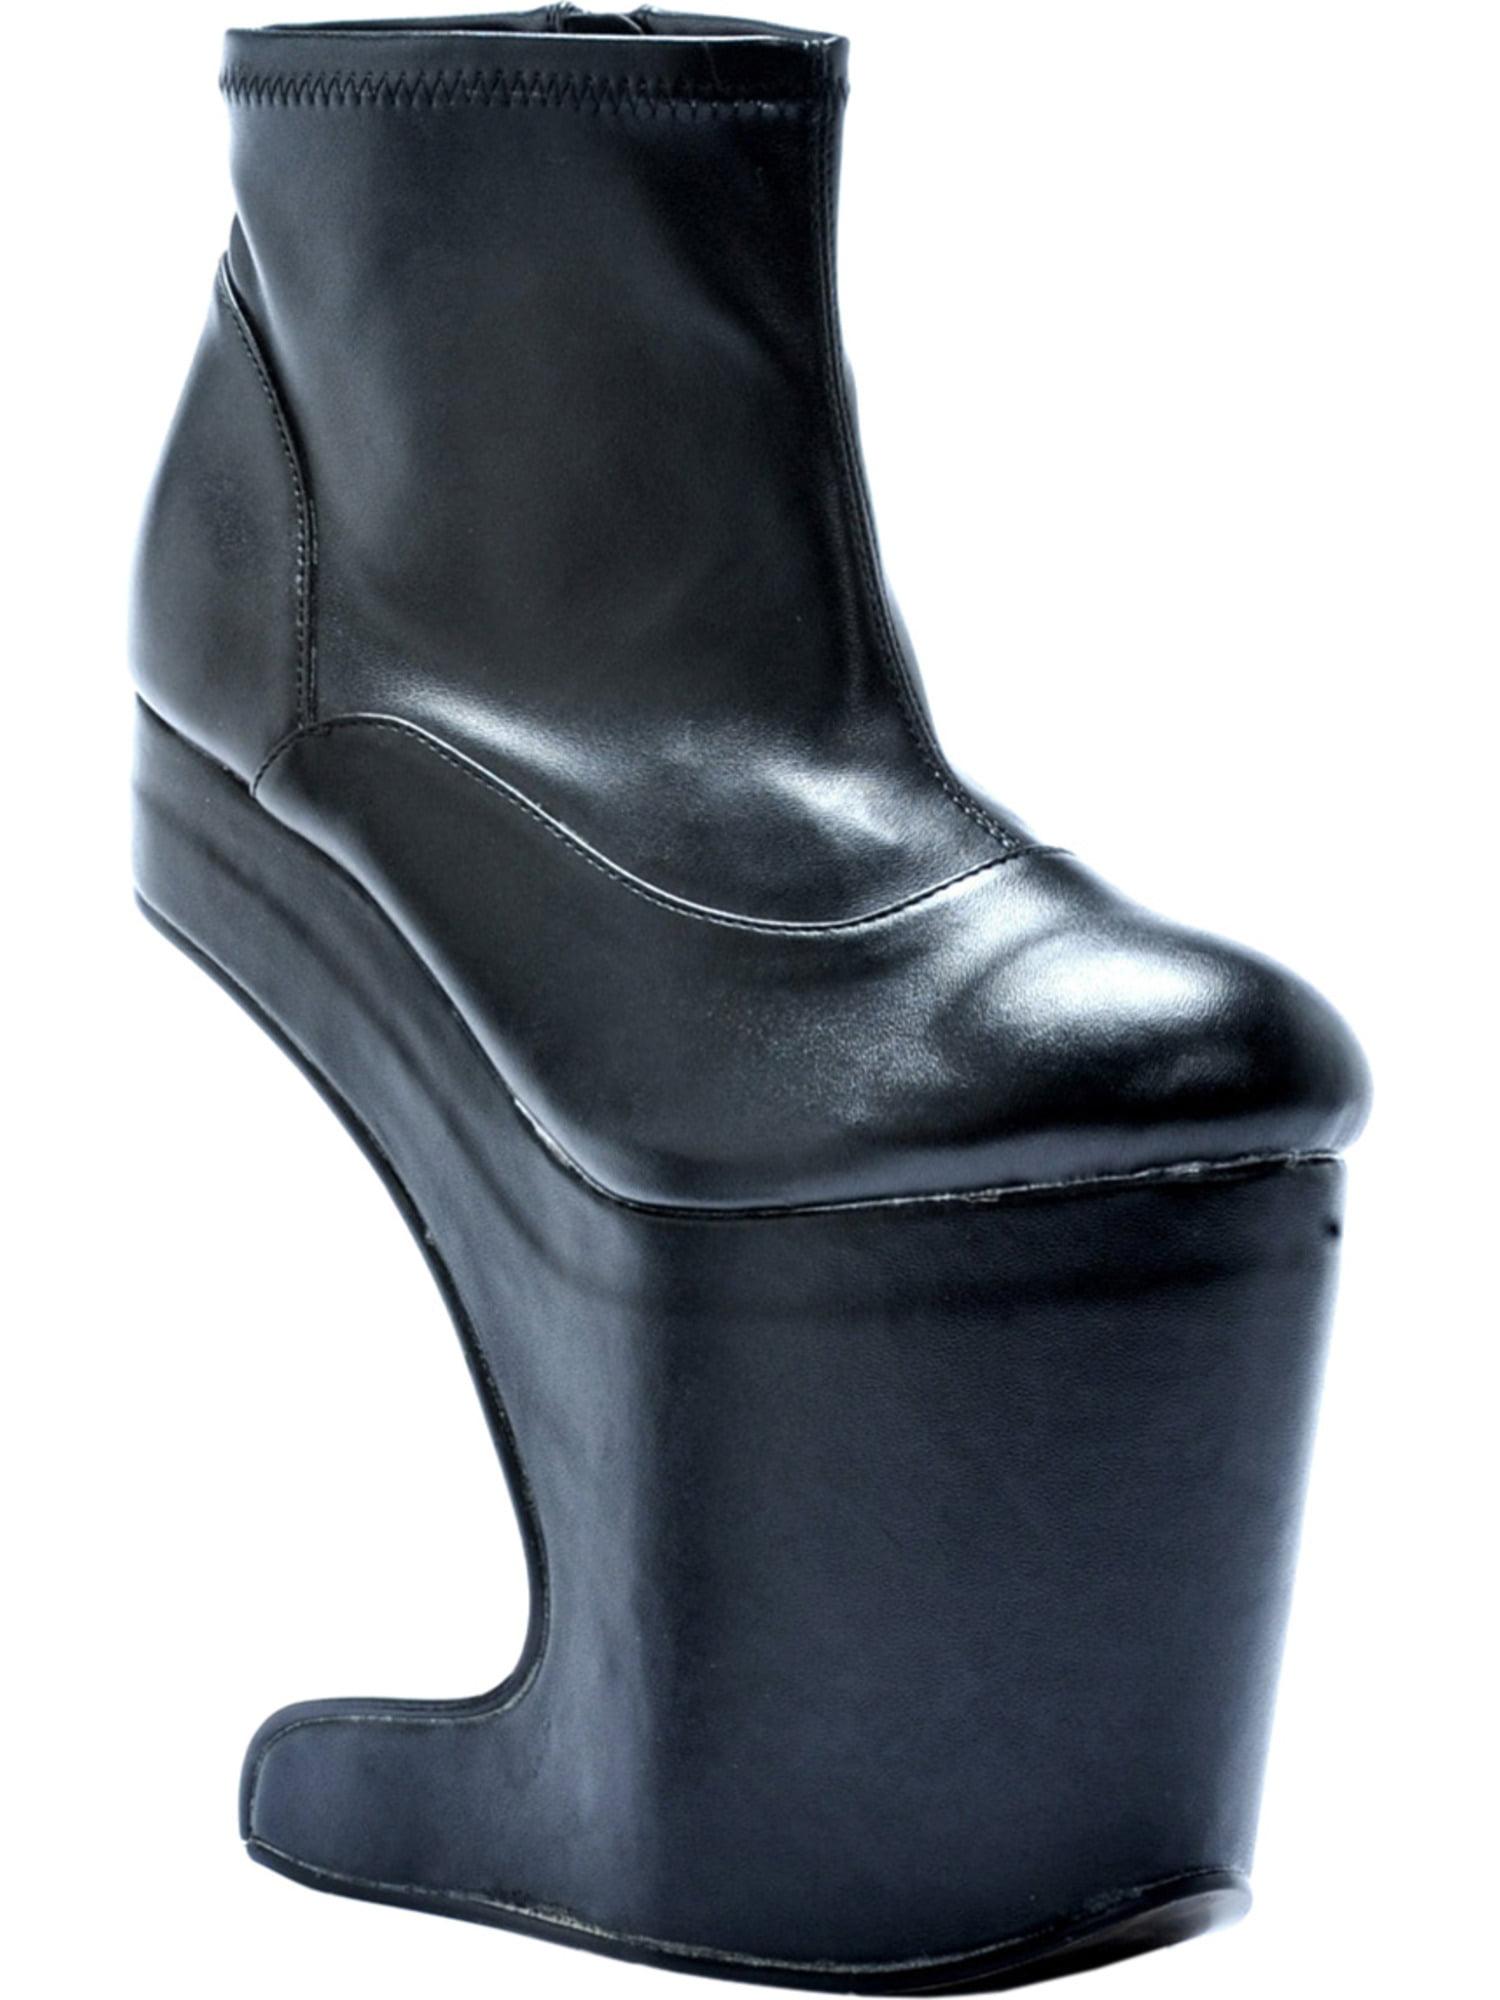 Matte Black Ankle Boots Women's Heel